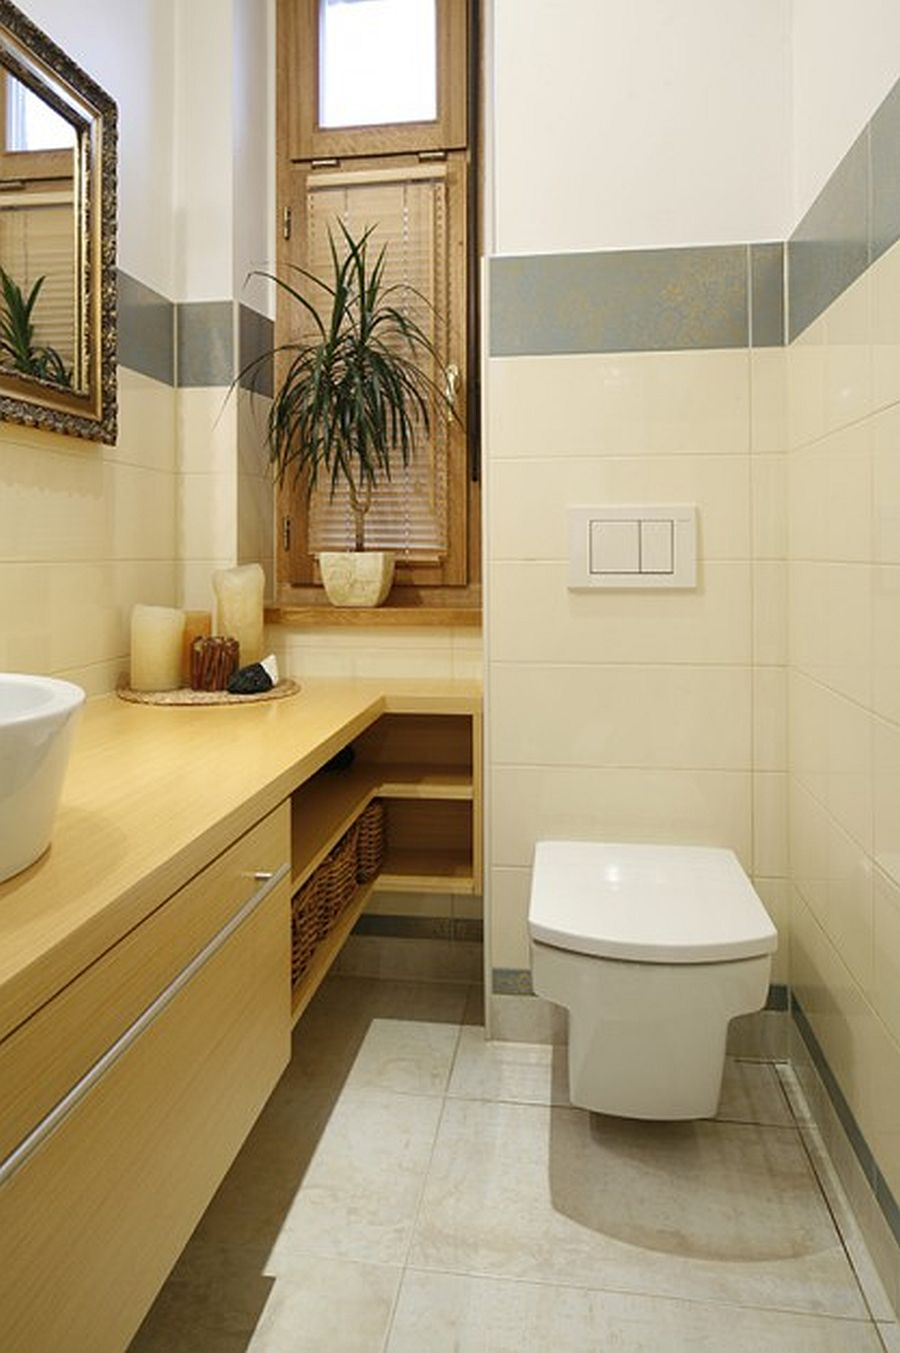 adelaparvu.com despre casa moderna cu piese de mobila clasice, Foto Urzadzamy (13)